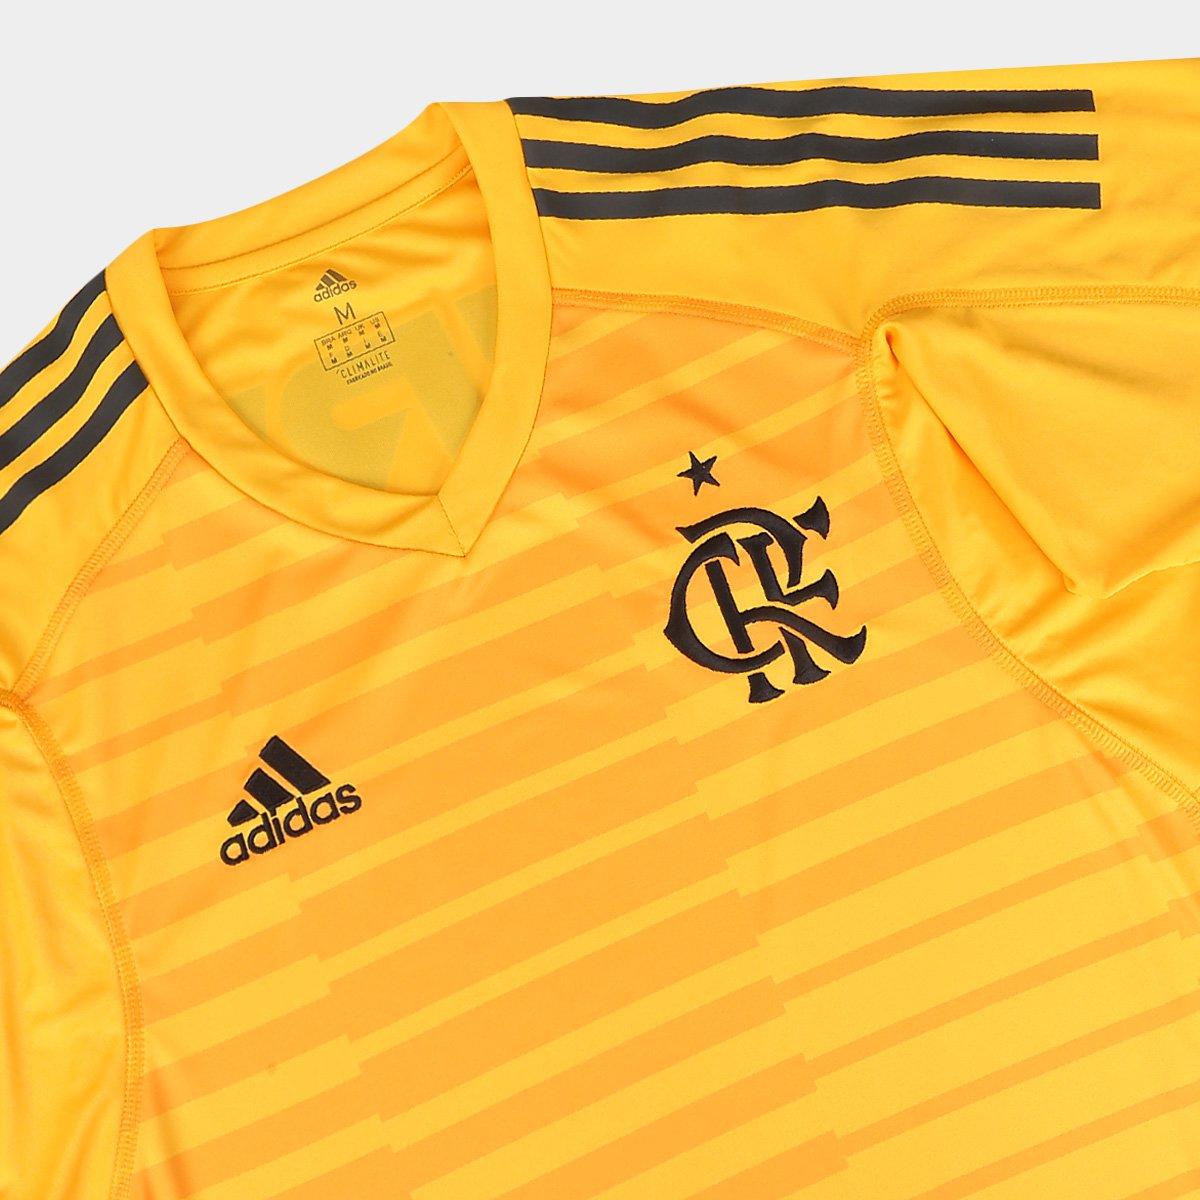 02d7f847ac Camisa de Goleiro Flamengo I 2018 s n° Torcedor Adidas Masculina ...